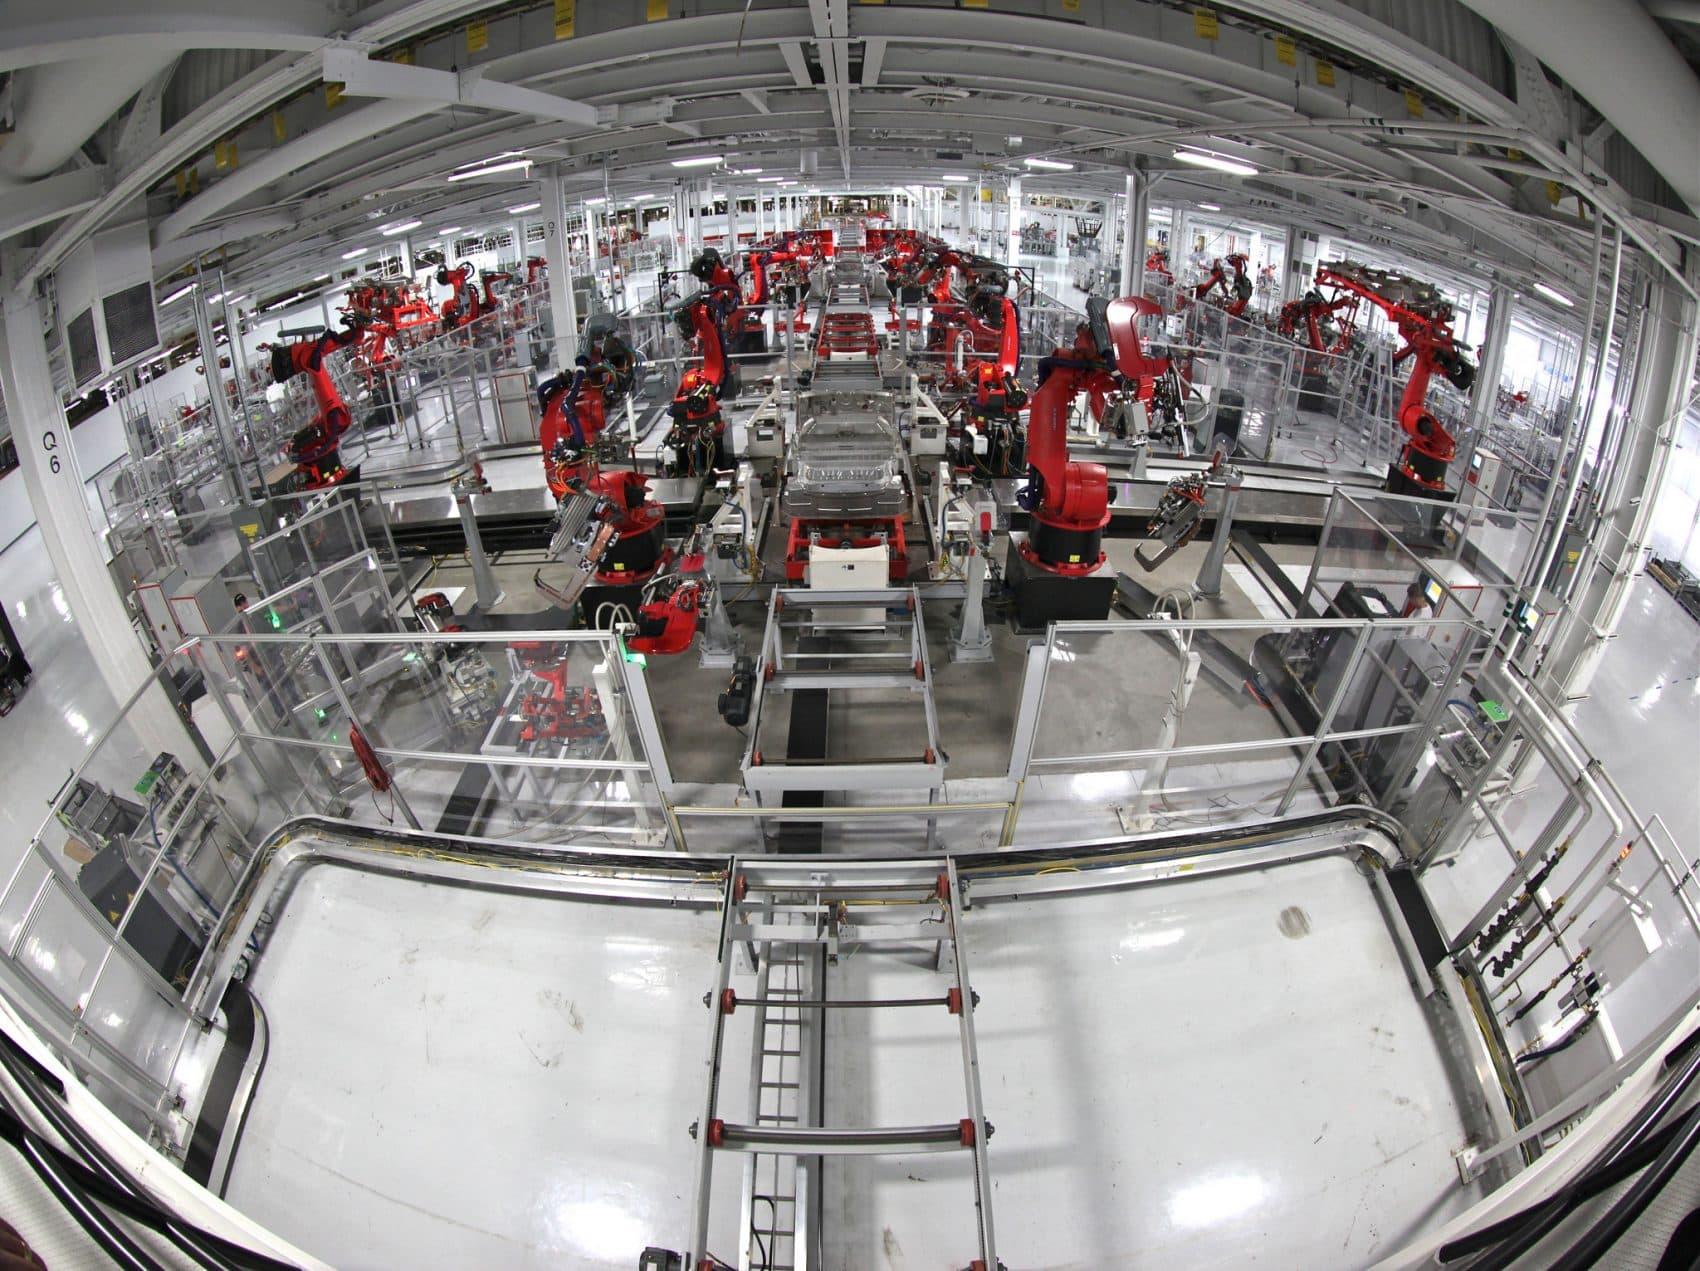 The Tesla Motors assembly line. (Steve Jurvetson/Flickr)